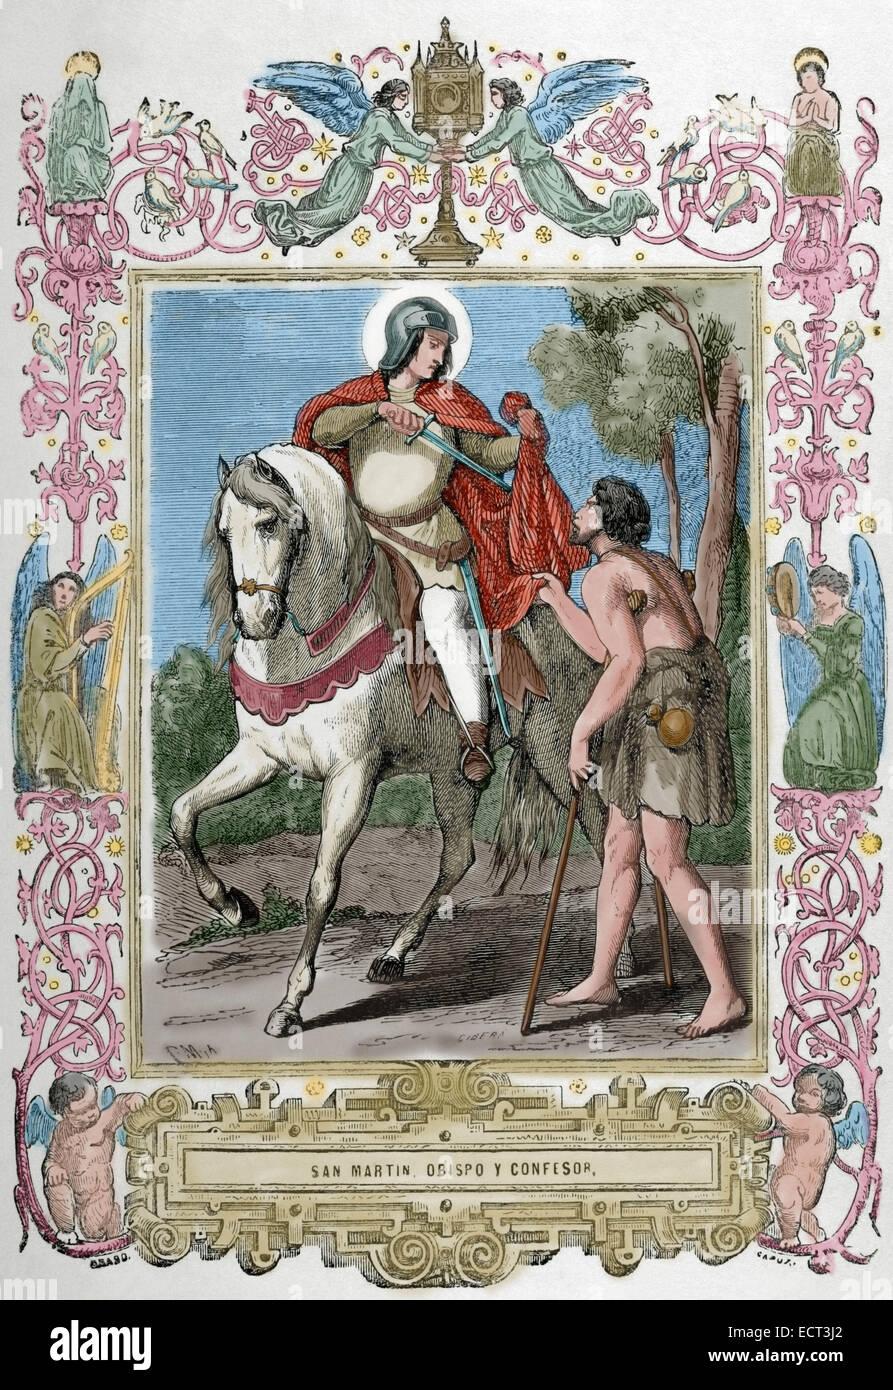 Saint Martin of Braga (520-580). Archbishop of Bracara Augusta i Gallaecia (now Braga, Portugal). St. Martin sharing - Stock Image